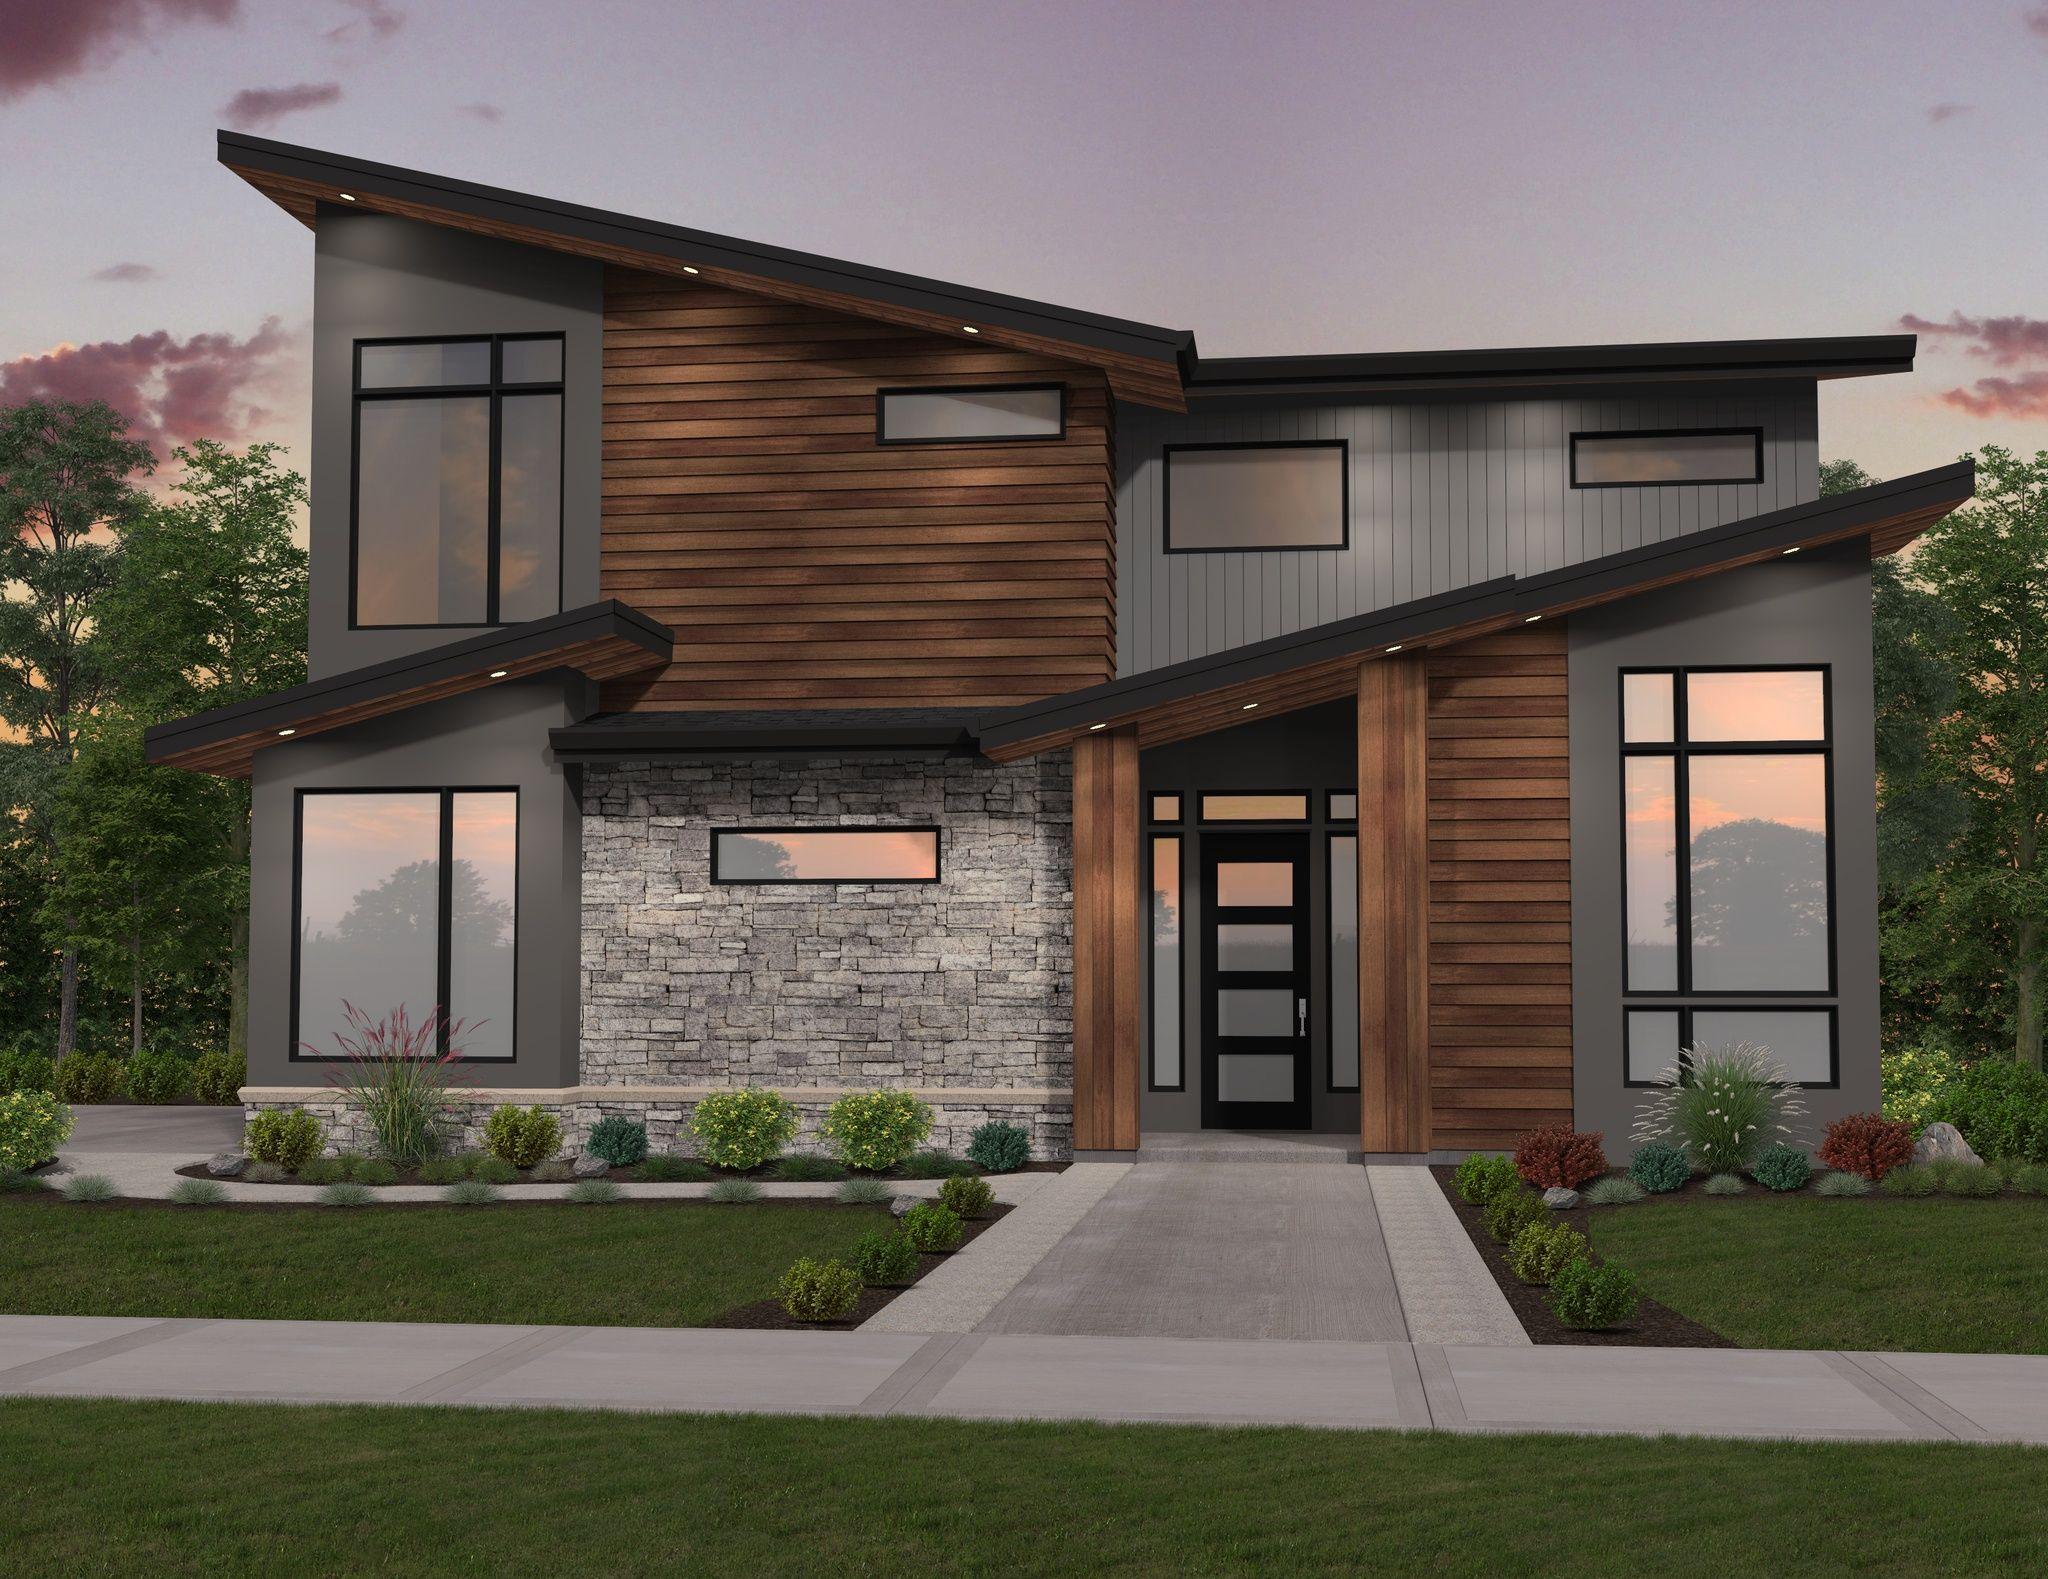 Ozark | Mark Stewart Home Design | 2.Mimari | Pinterest